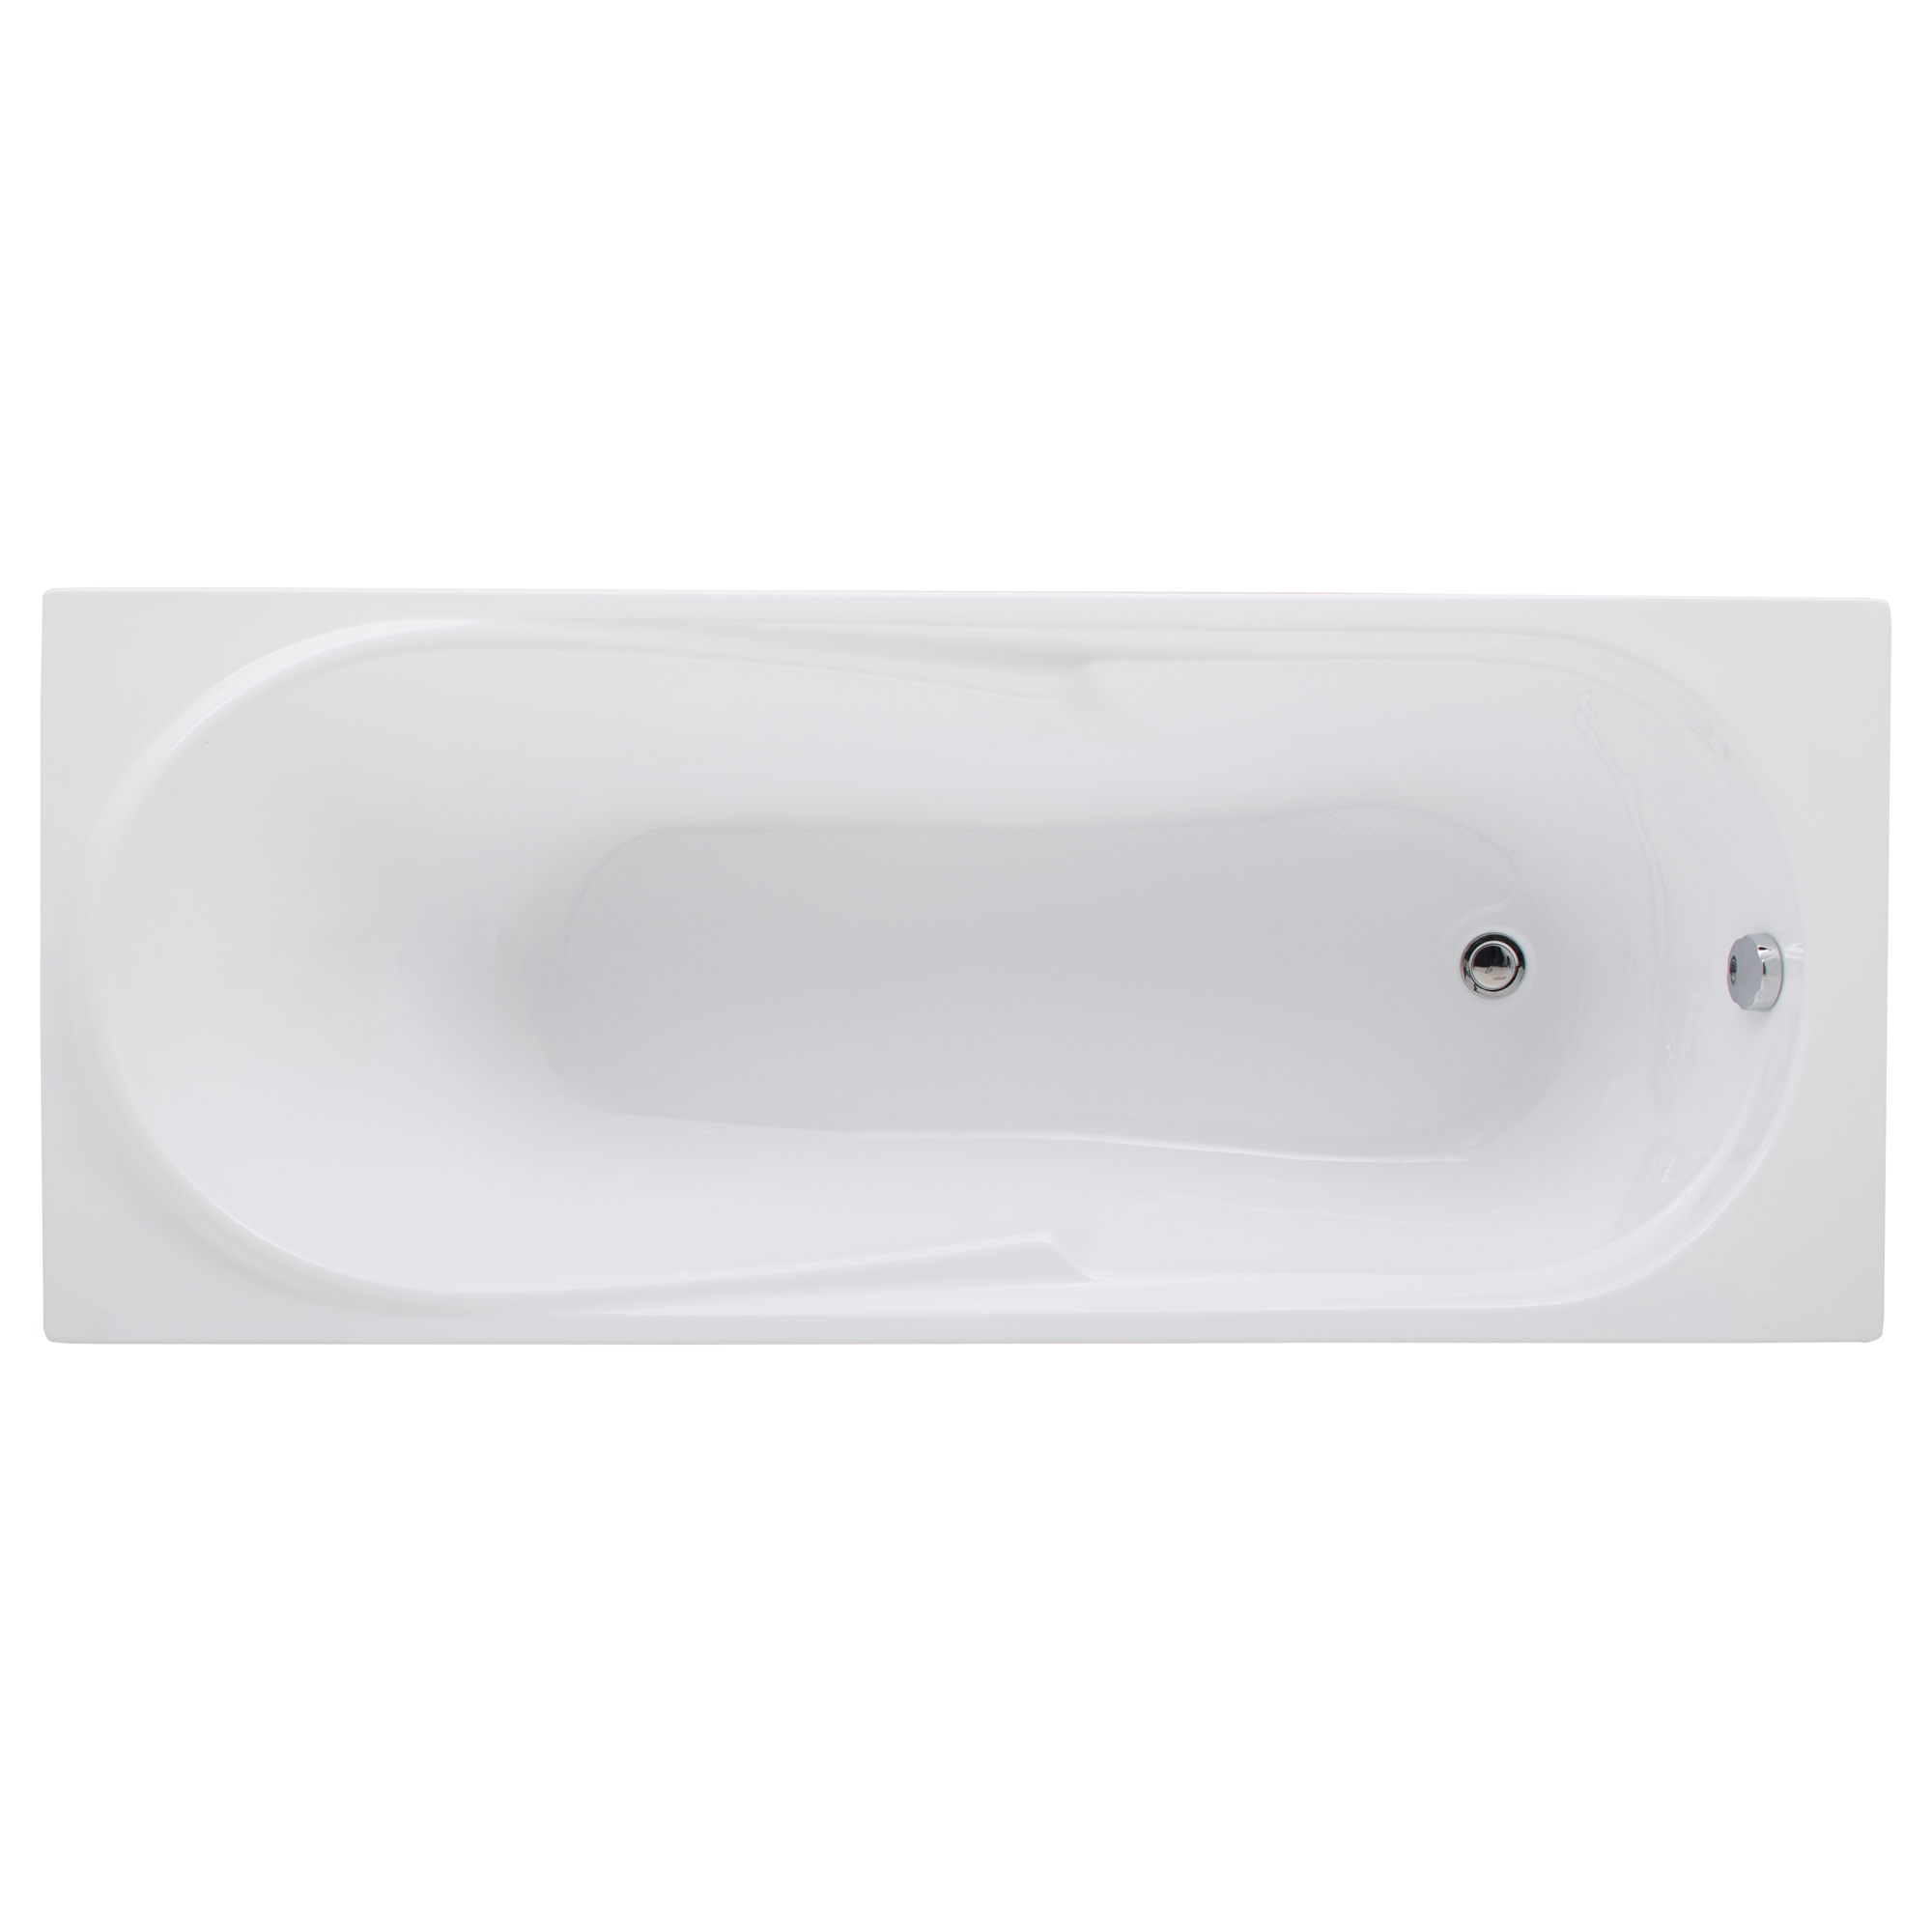 Акриловая ванна Aquanet Hellas 170х70 без гидромассажа акриловая ванна am pm like 170х70